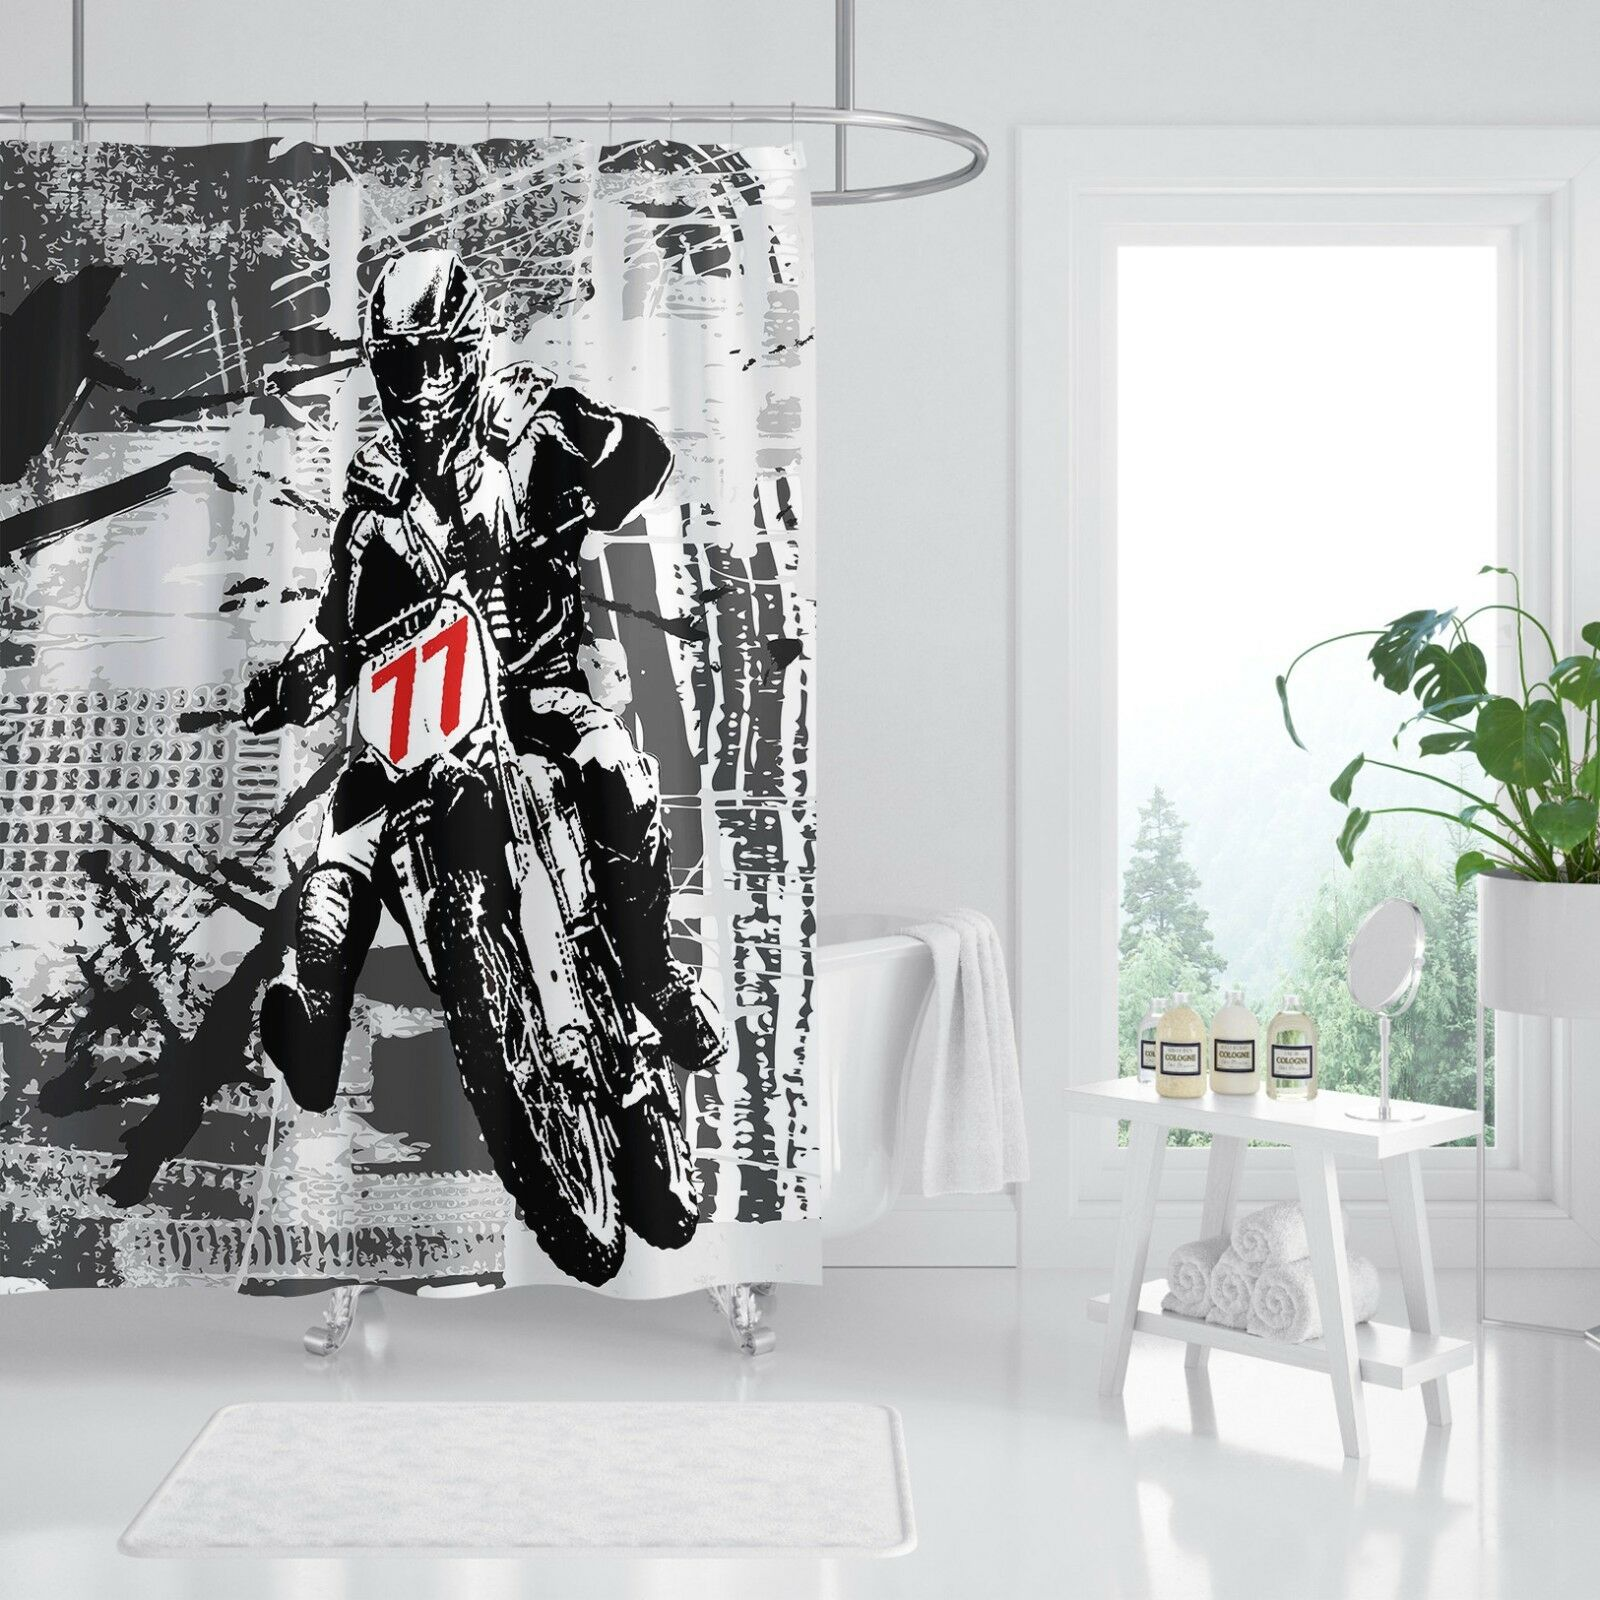 3D Motorrad Mann 2 Duschvorhang Wasserdicht Faser Bad Daheim Windows Toilette DE